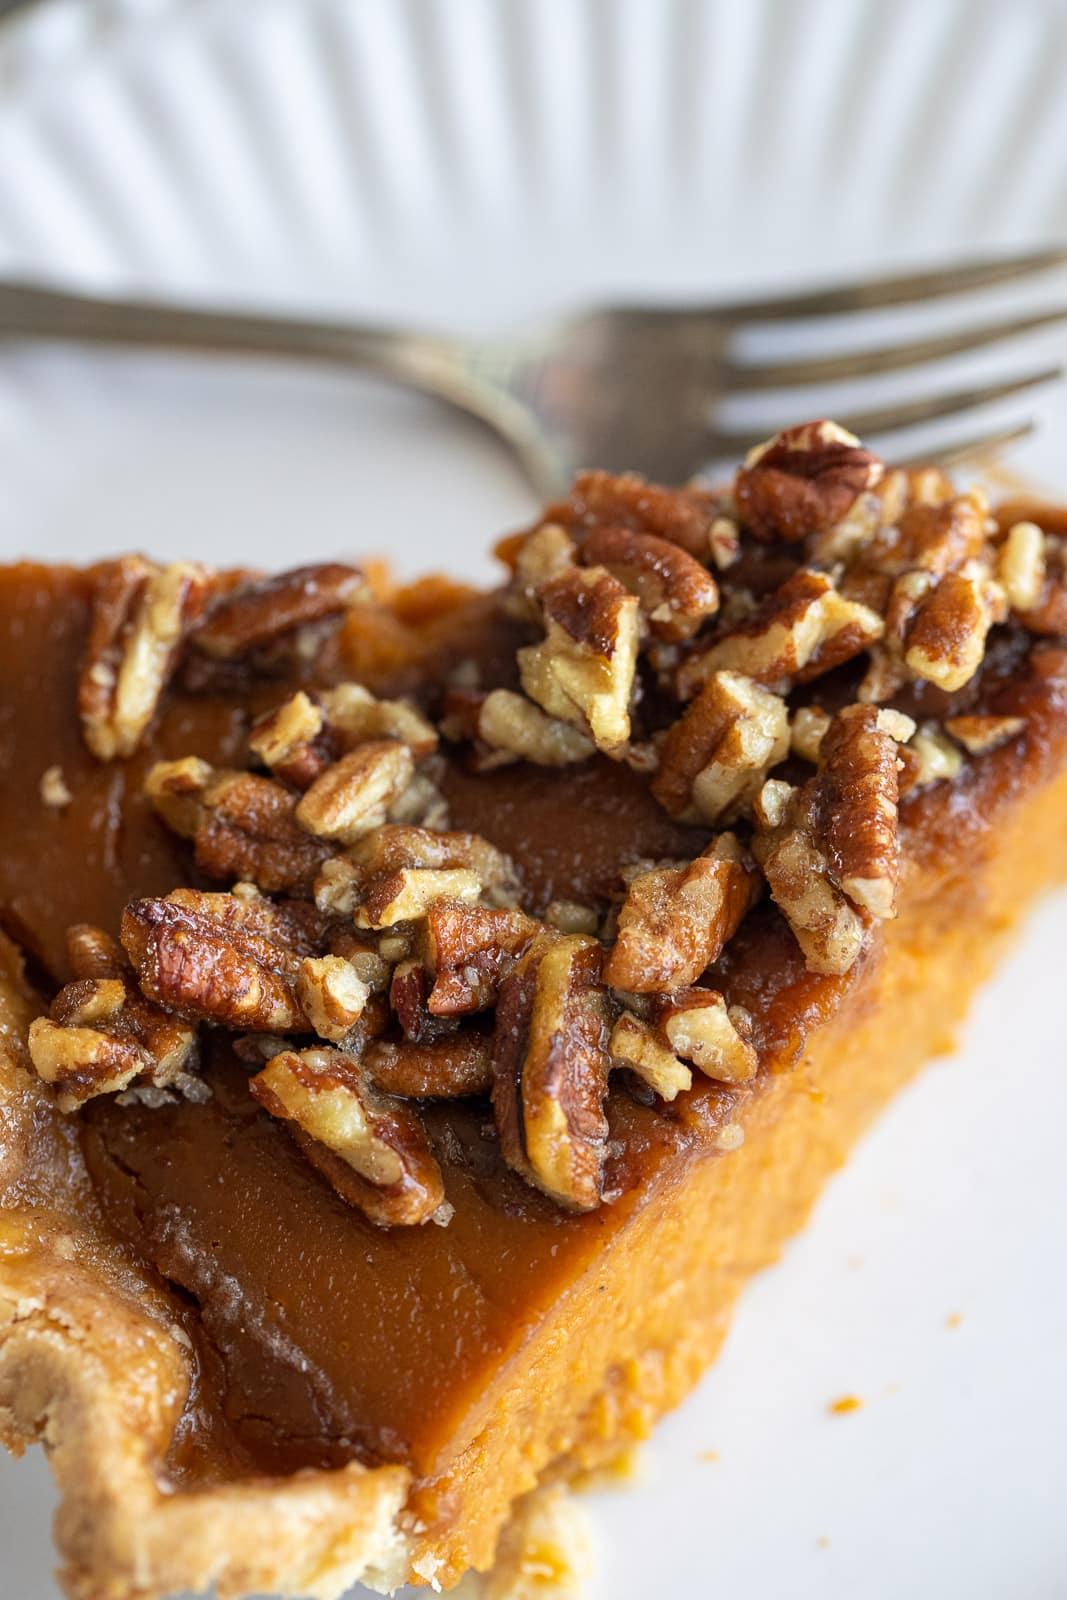 Slice of praline pumpkin pie on a plate.